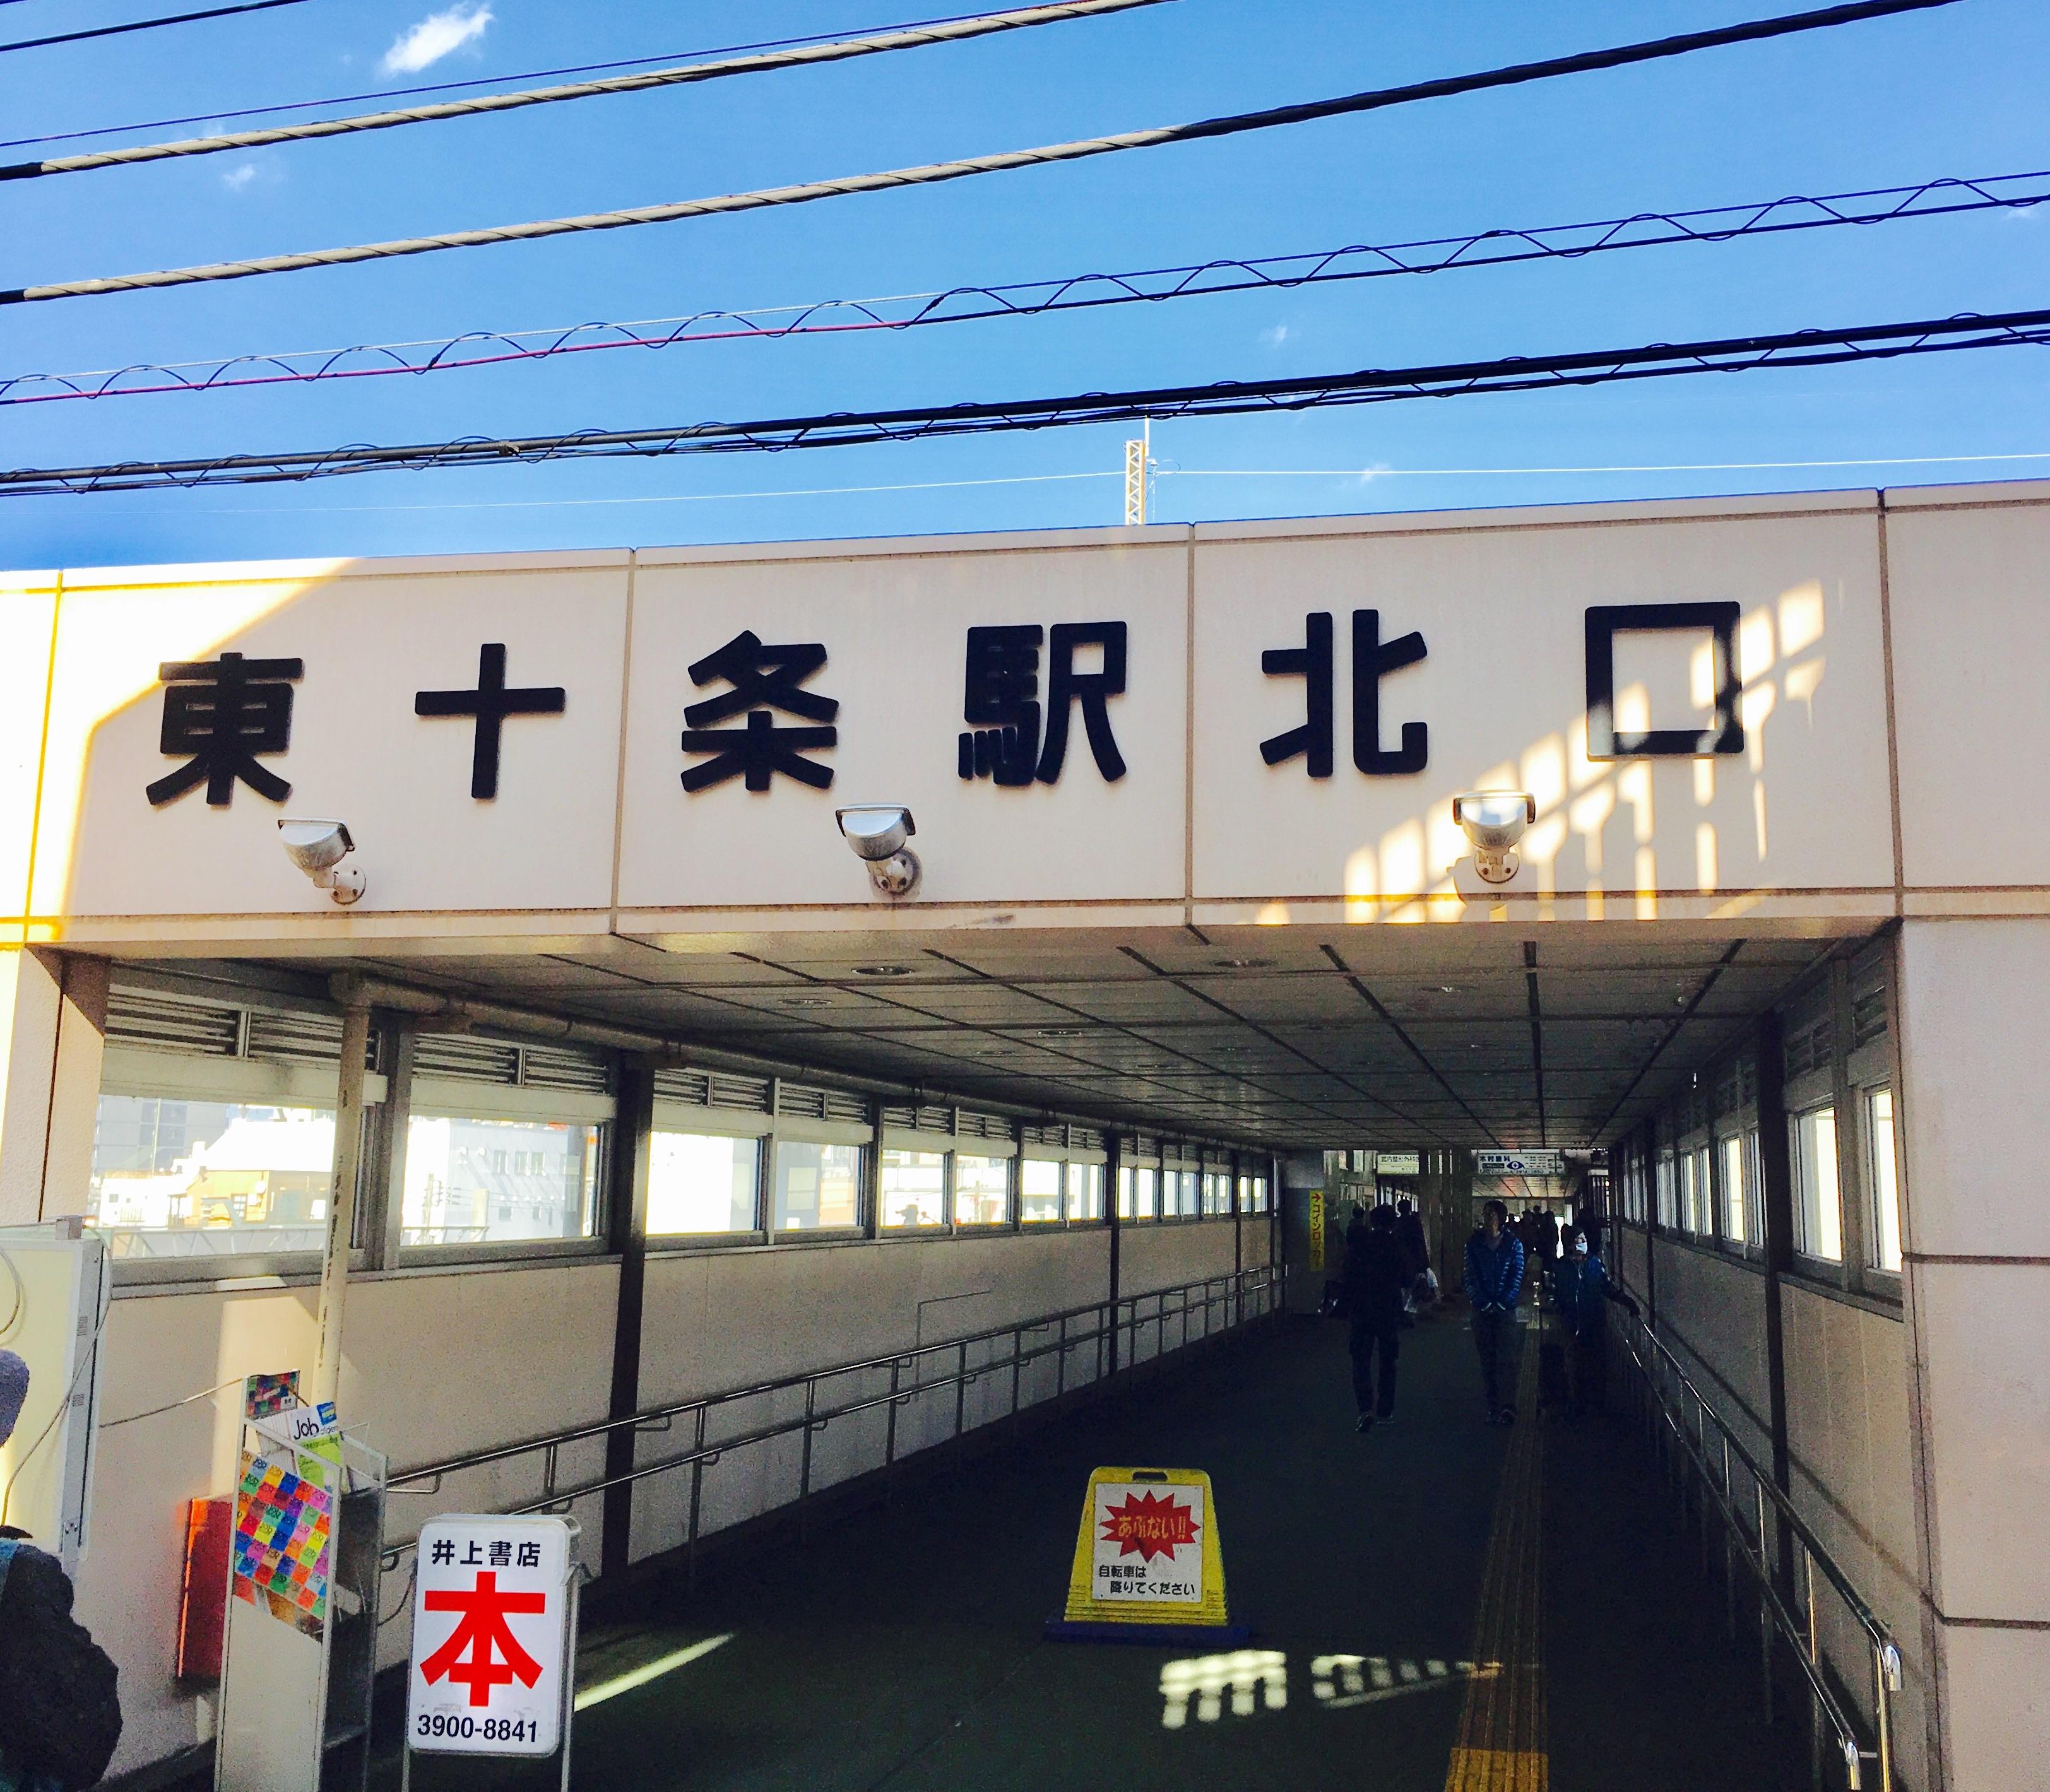 f:id:SoichiroIkeshita:20170316022813j:image